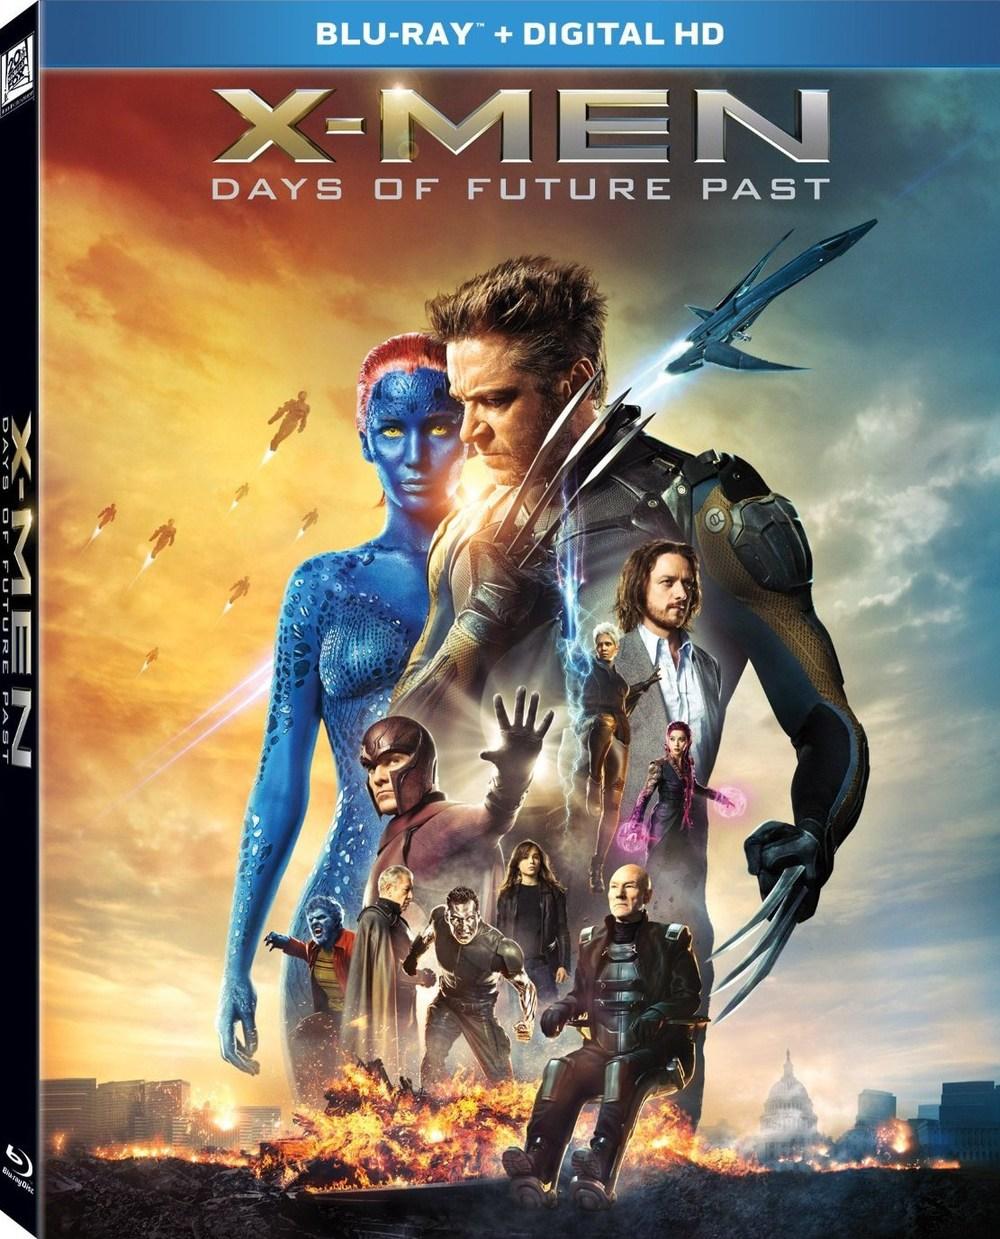 X-Men-Days-Of-Future-Past-Blu-ray-3.jpg